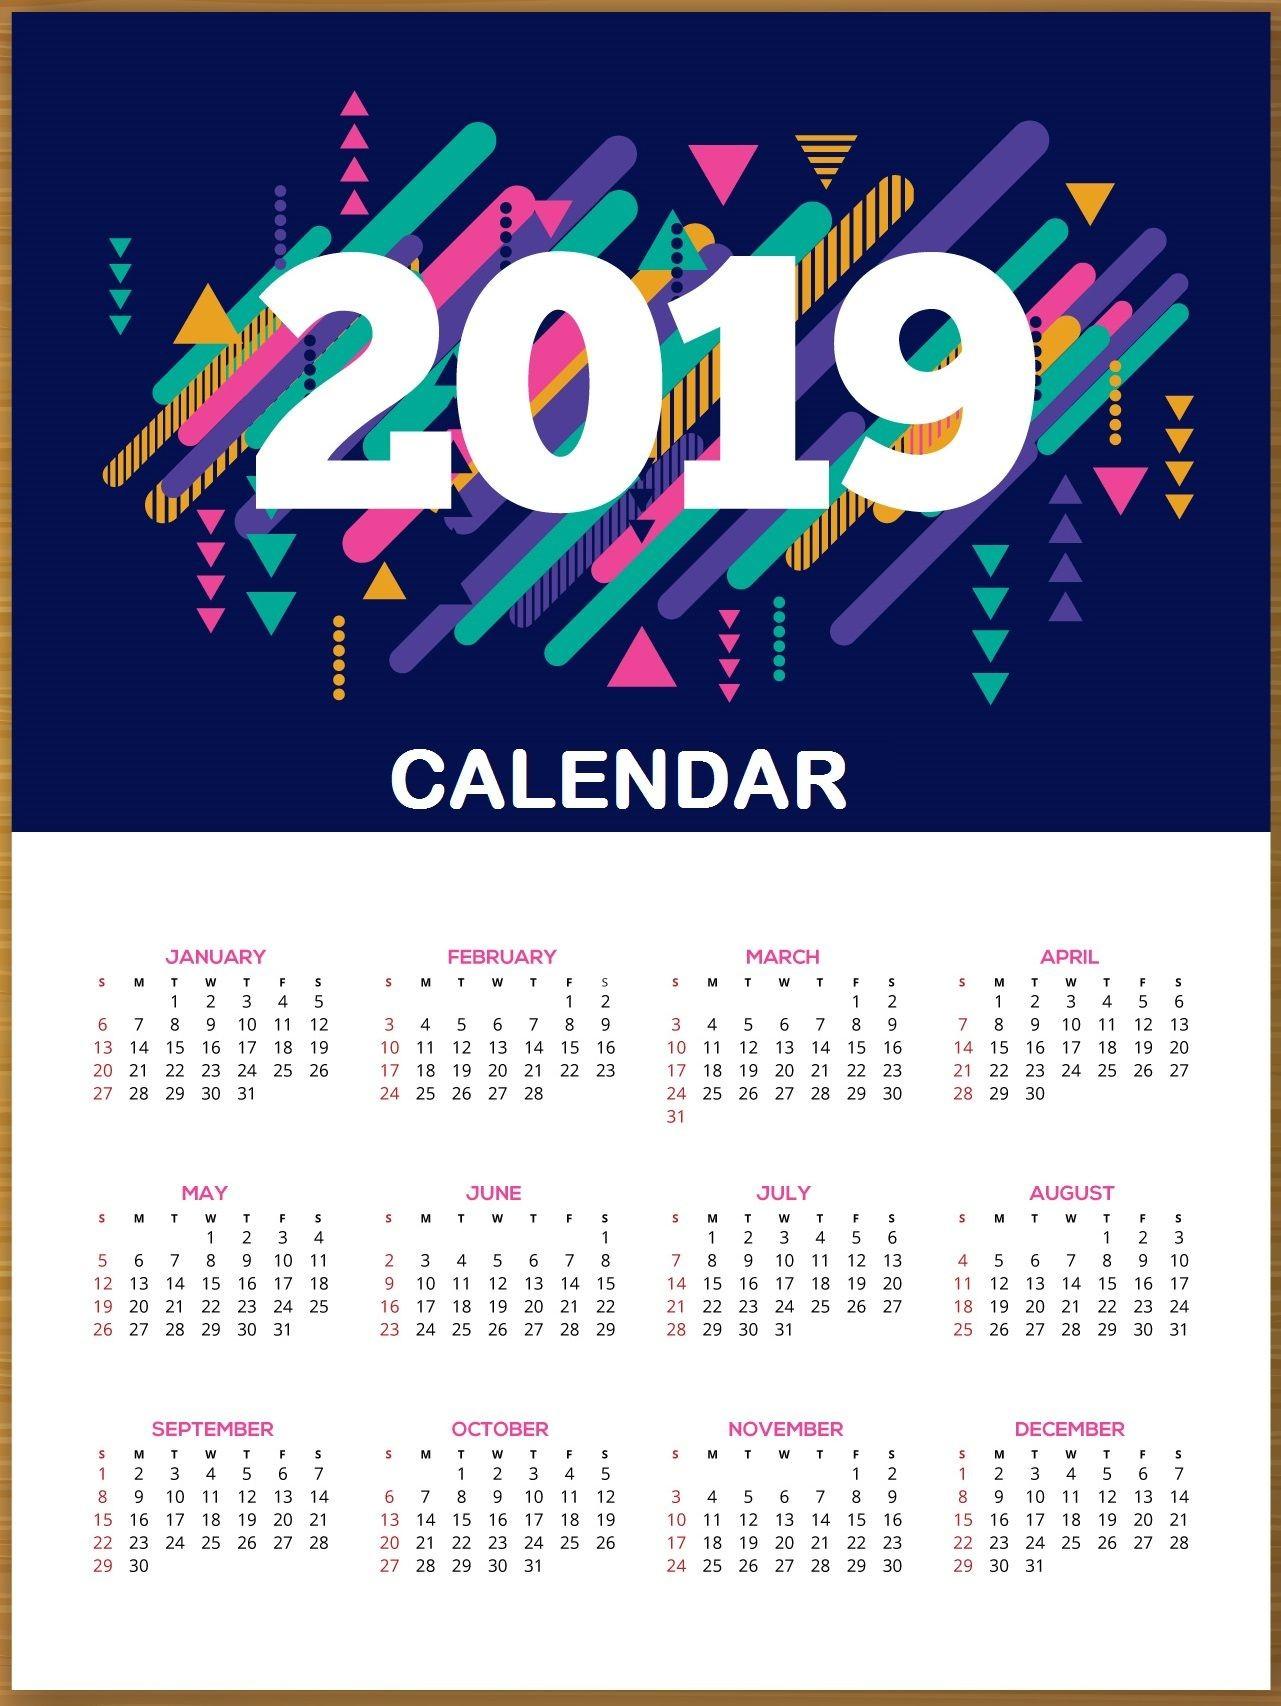 2019 HD Calendar Printable 2019calendar PrintableCalendar calendar2019 calendar CalendarTemplate calendardesign